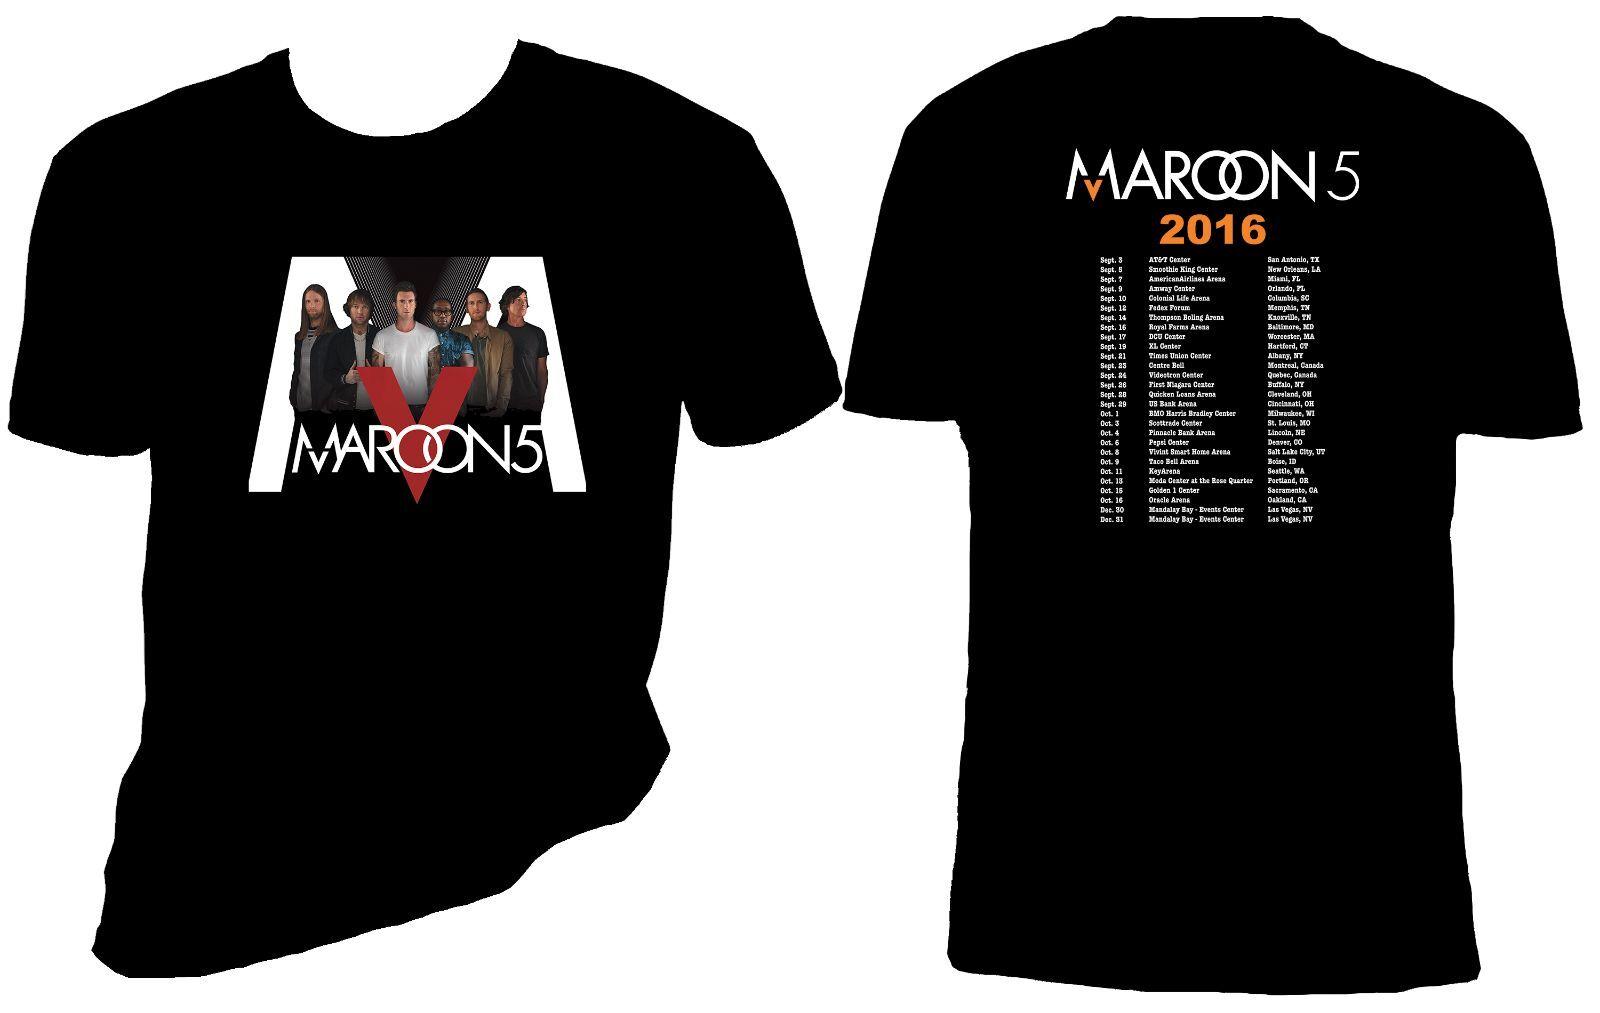 Maroon 5 T Shirt, Maroon 5 Concert T Shirt, Adam Levine, ...